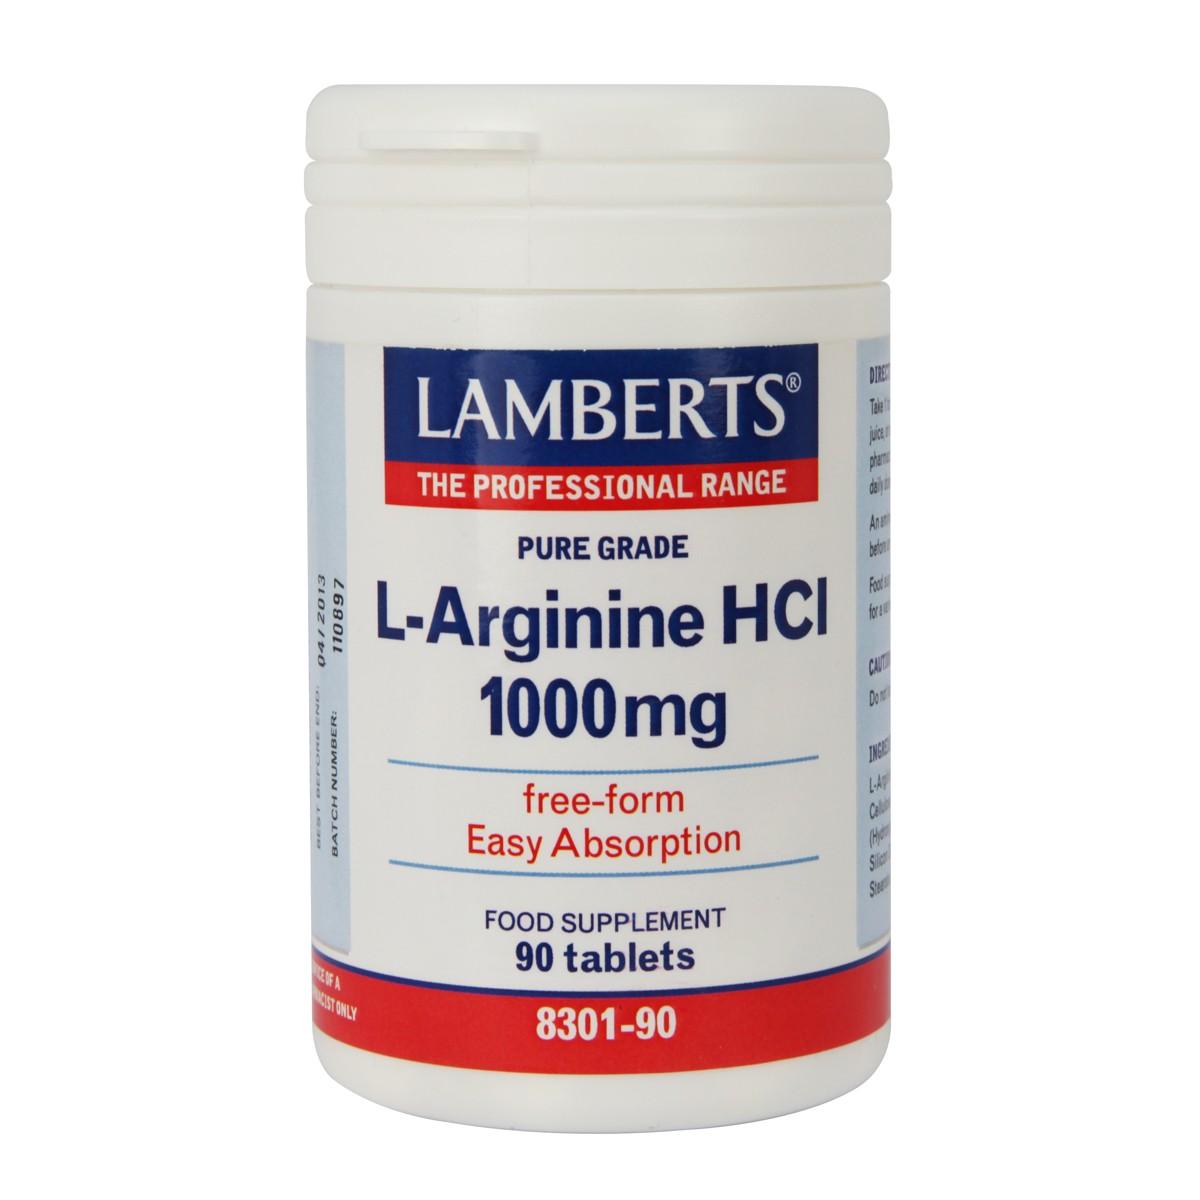 Lamberts L-Arginine HCI 1000mg